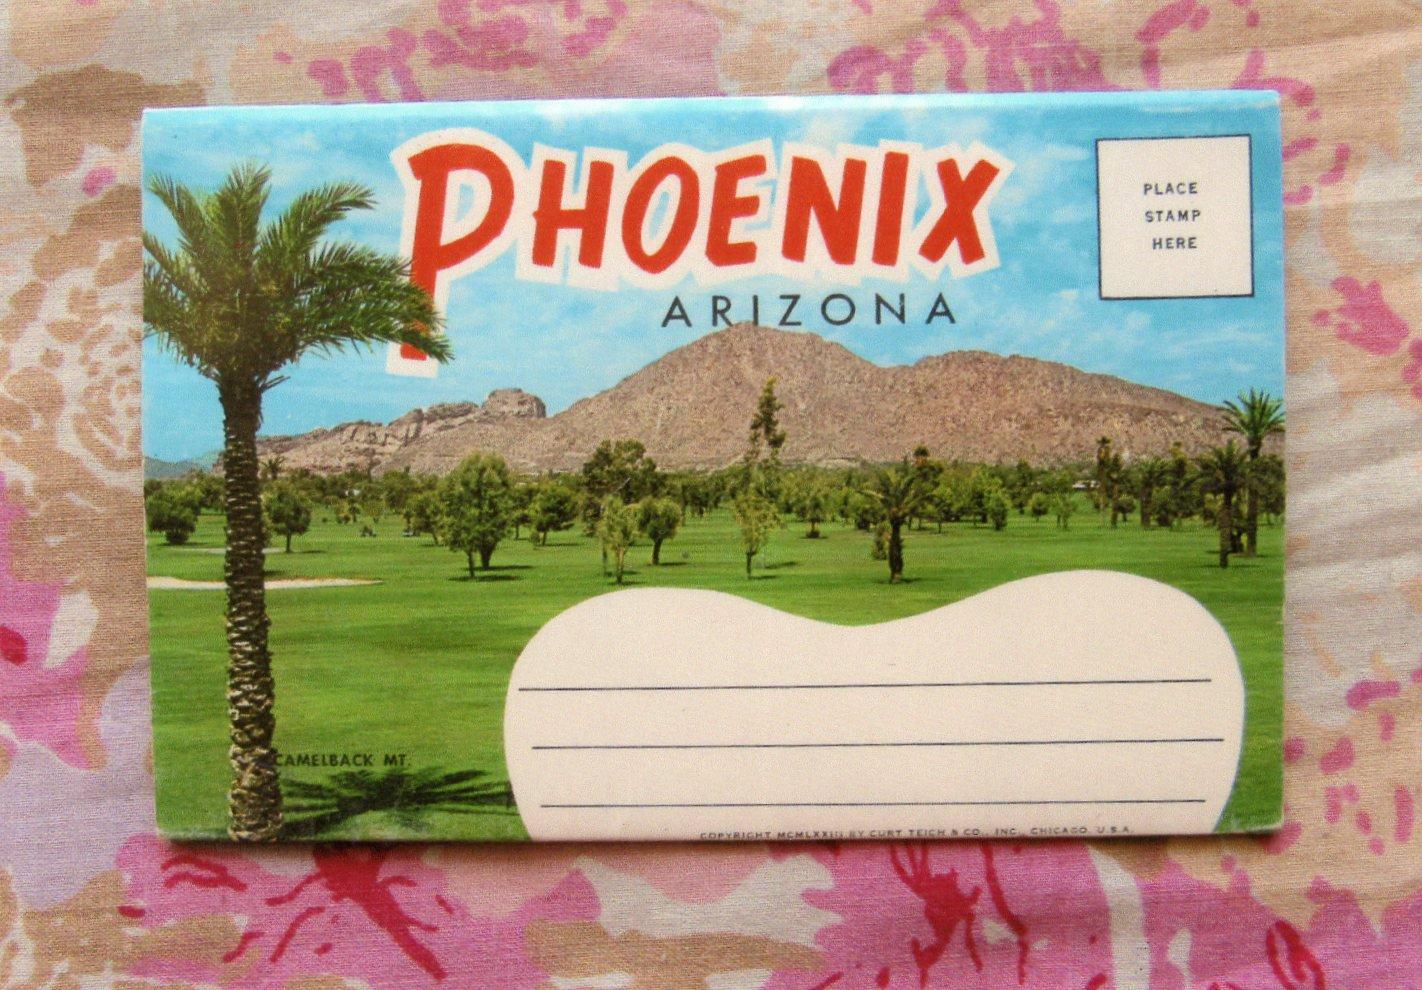 Phoenix, Arizona Vintage Postcard Folder, Fold-Out Pictures, Scenic, Street Views, Desert